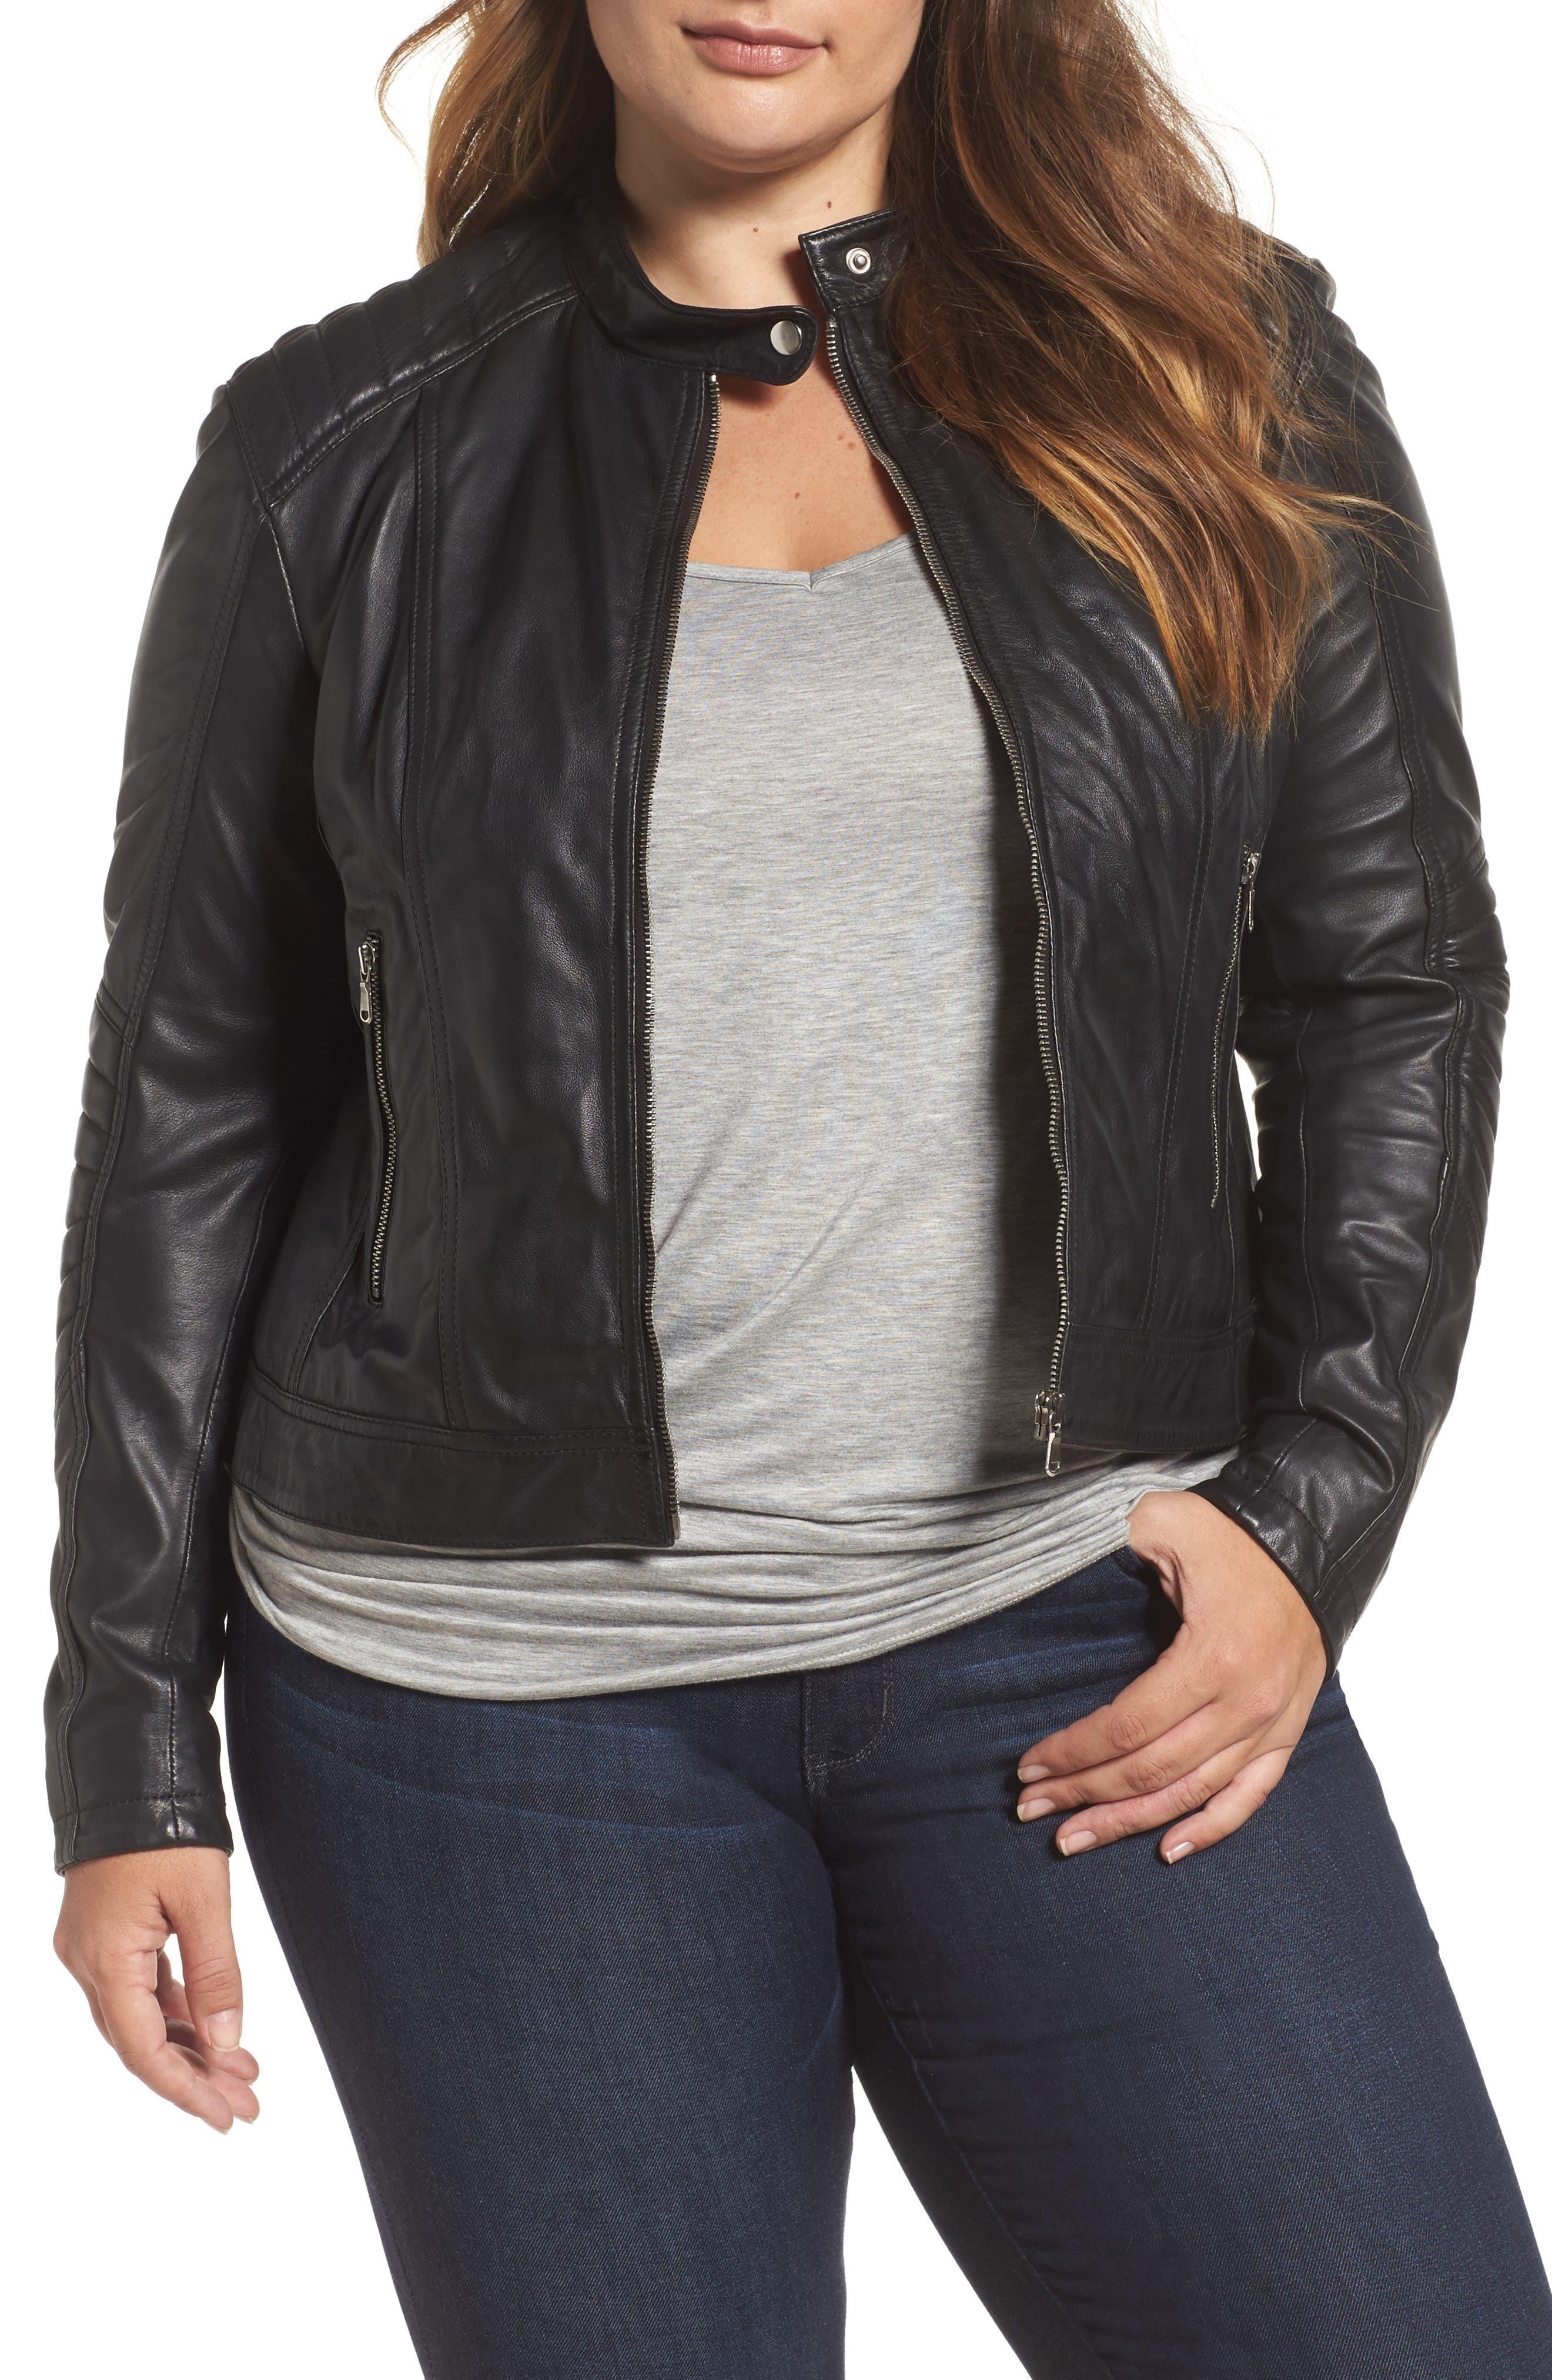 SLINK Jeans Leather Moto Jacket (Plus Size)